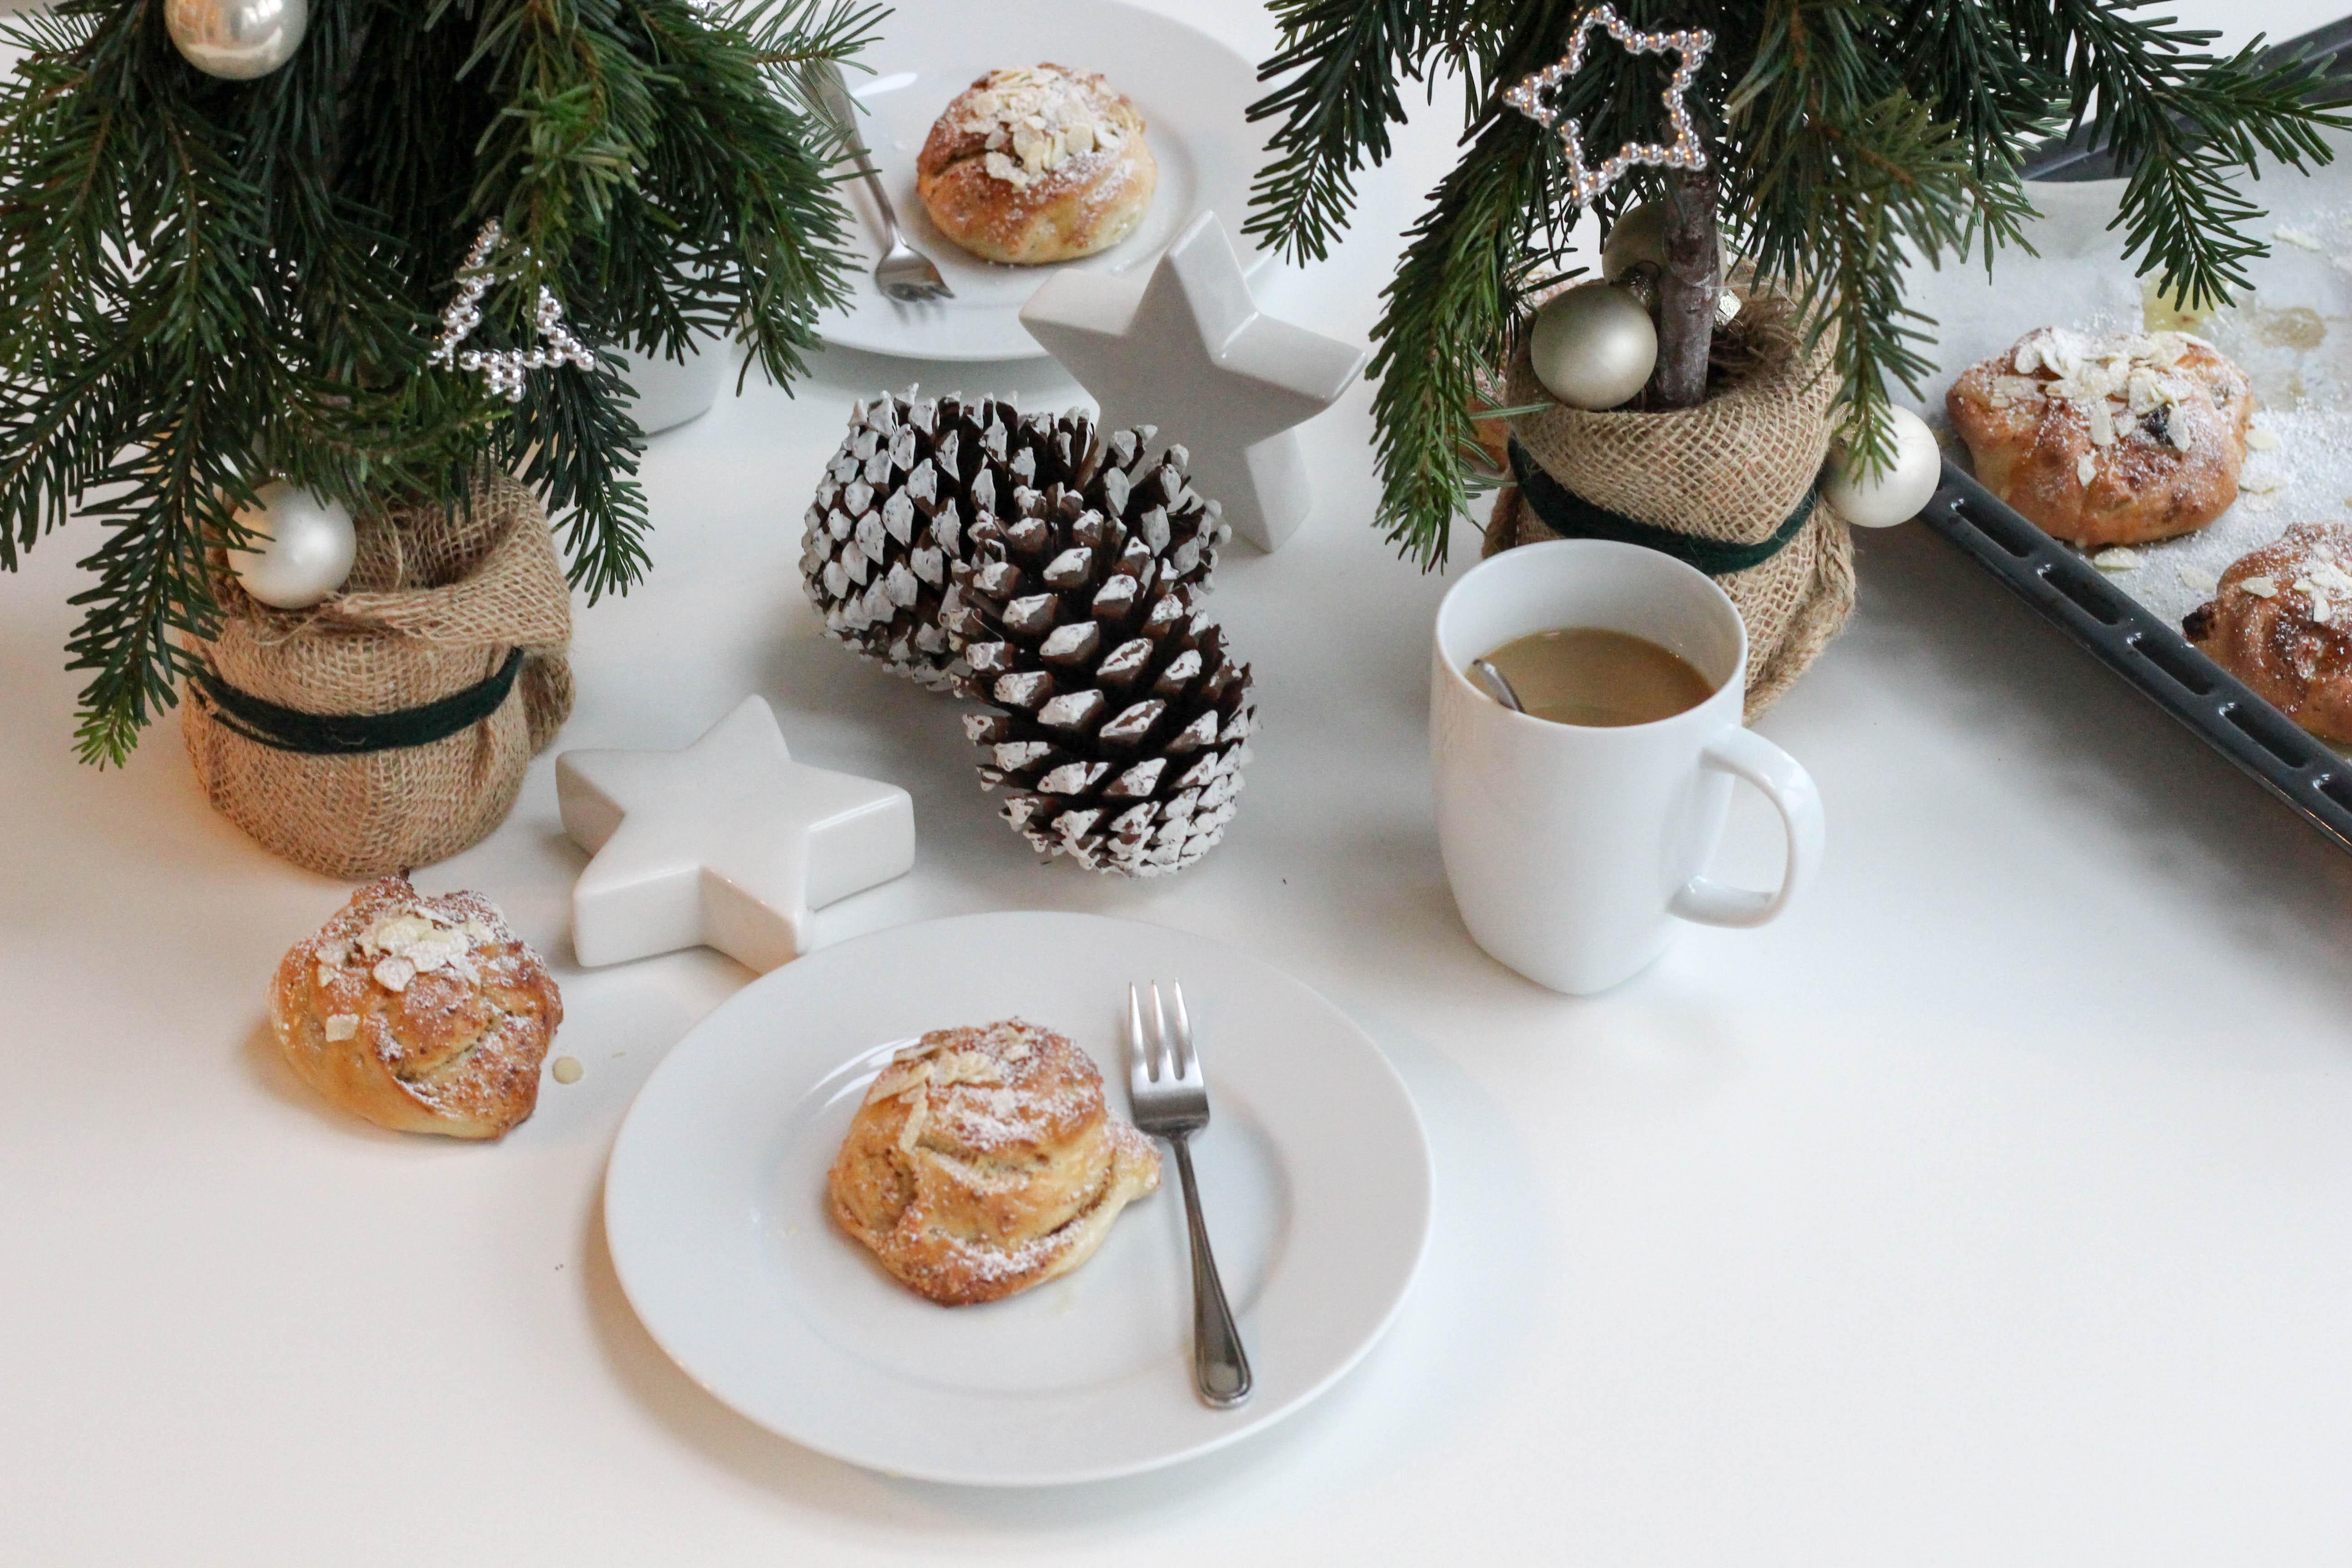 vegane-nussknoepfe-diy-Christbaum-selbstgemacht-christmas-homespa-plantbased